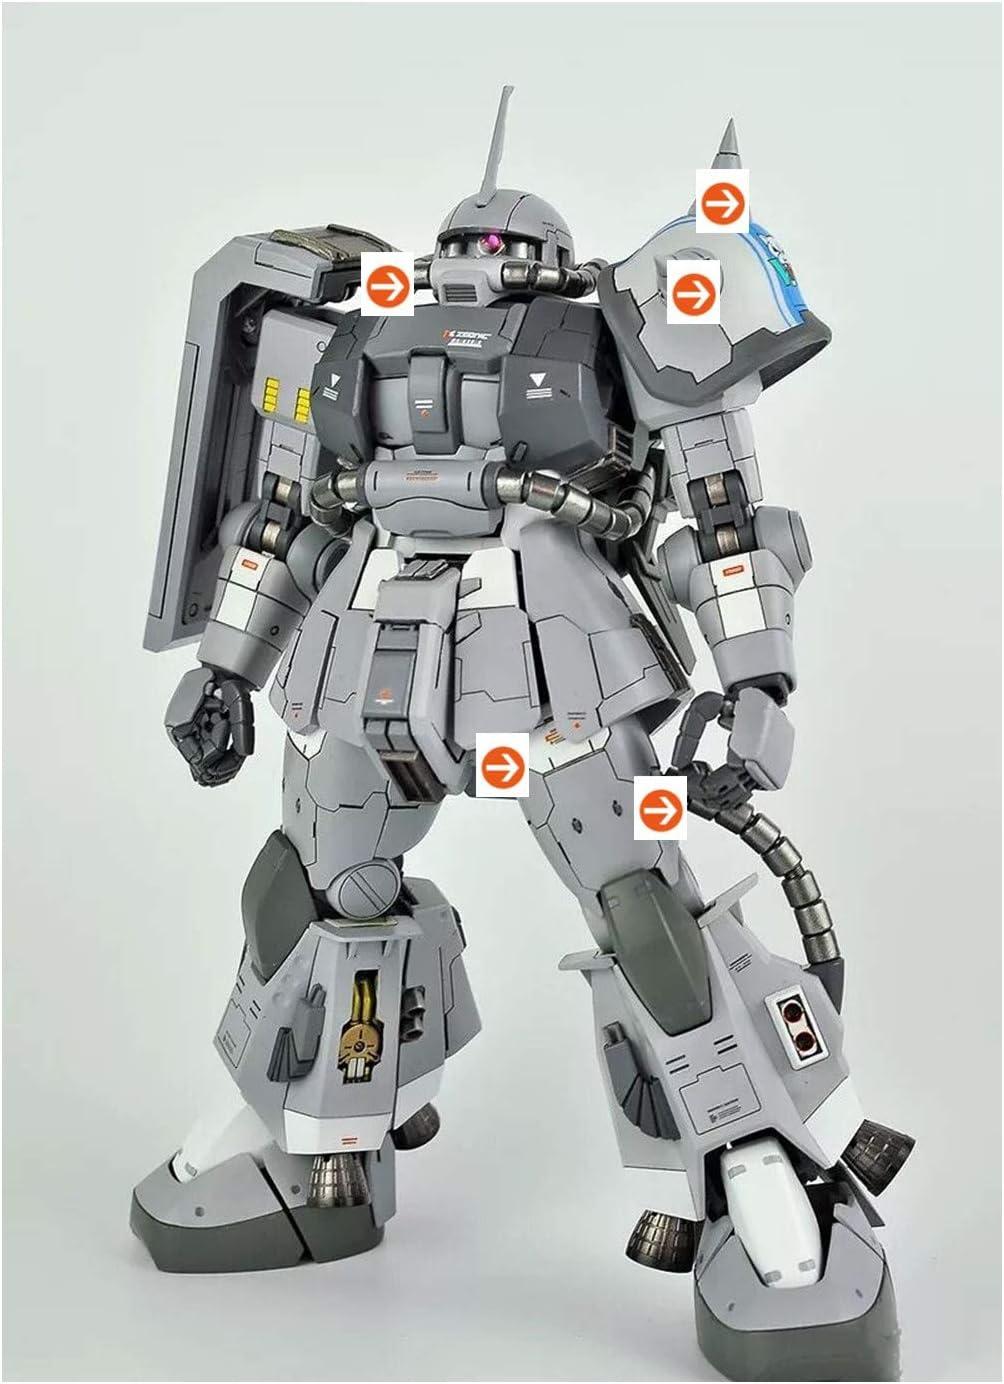 Metal Modified Parts 完全送料無料 Set Fits Bandai 毎週更新 1 Za MG MS-06R-1A Hobby 100